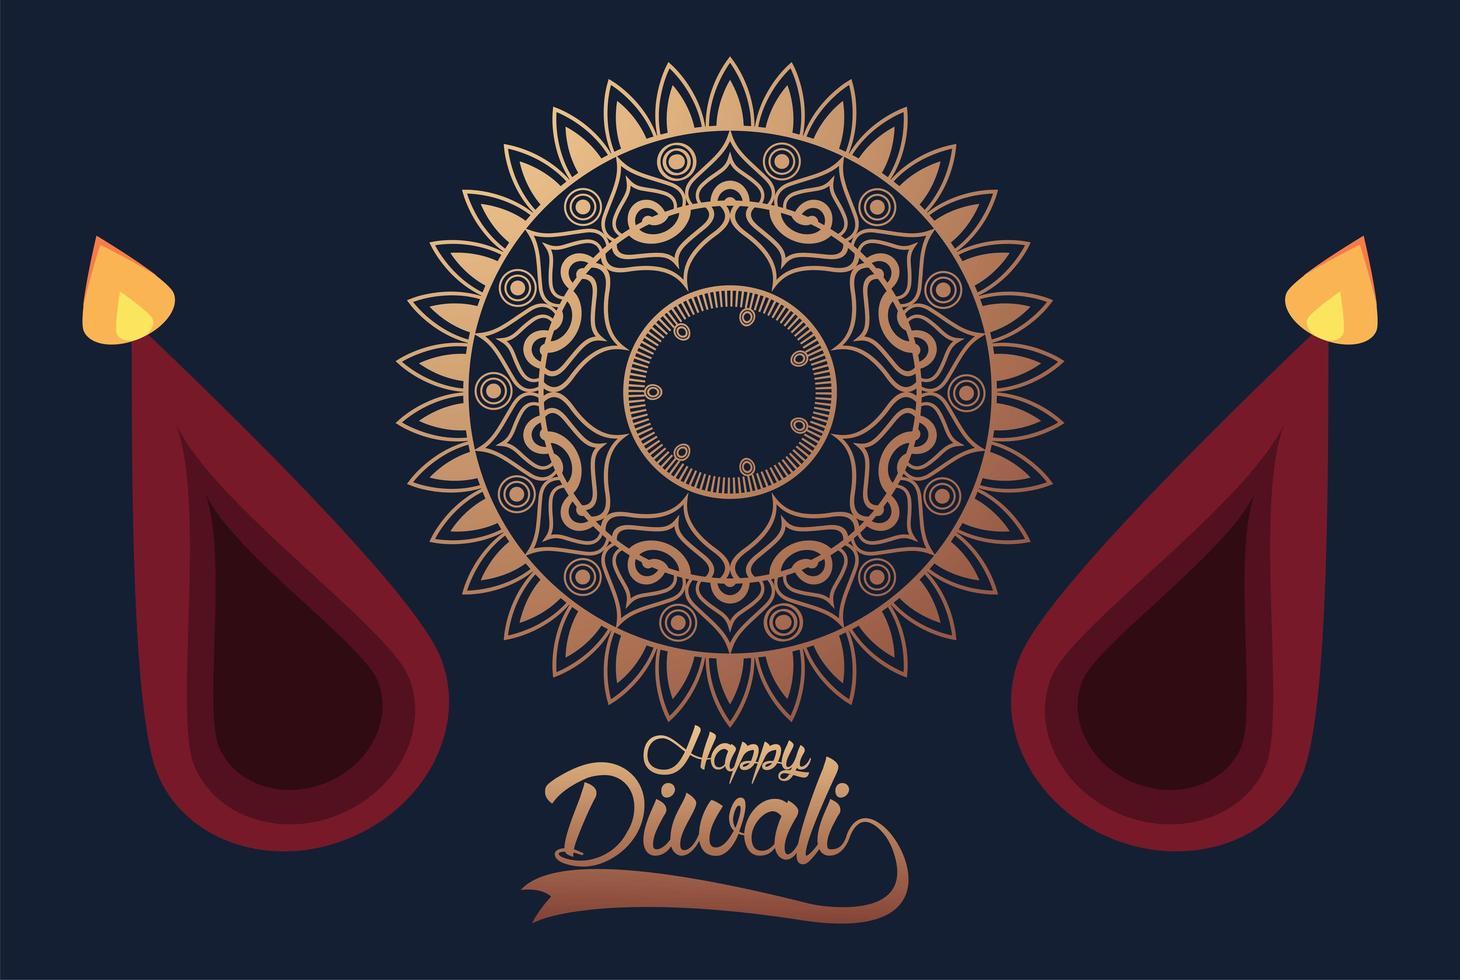 gelukkige diwali-viering met twee kaarsen en gouden mandala vector